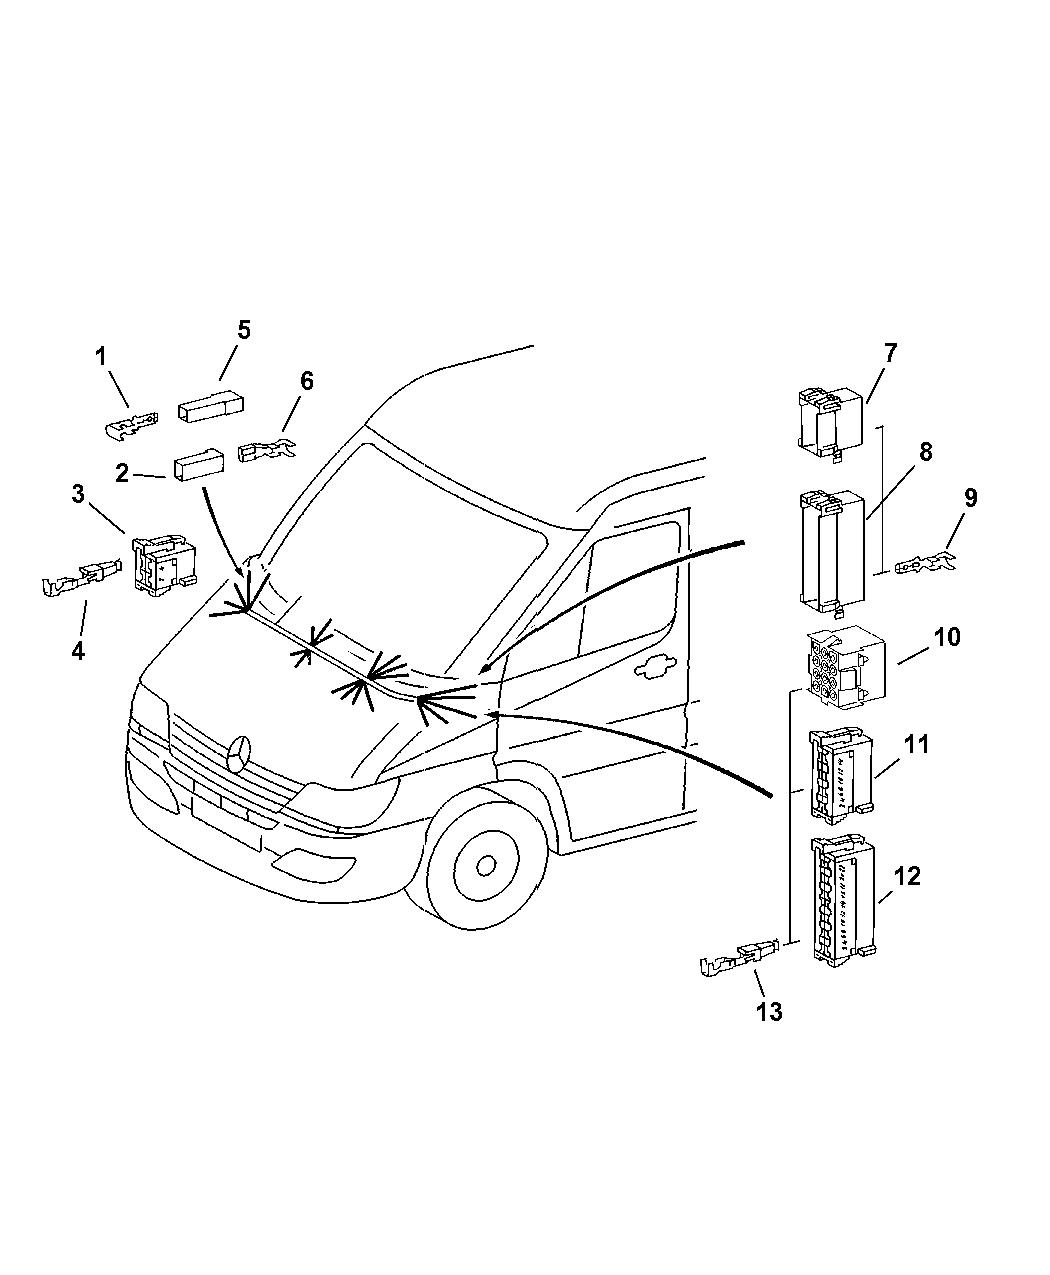 Dodge Sprinter Connectors Engine Compartment